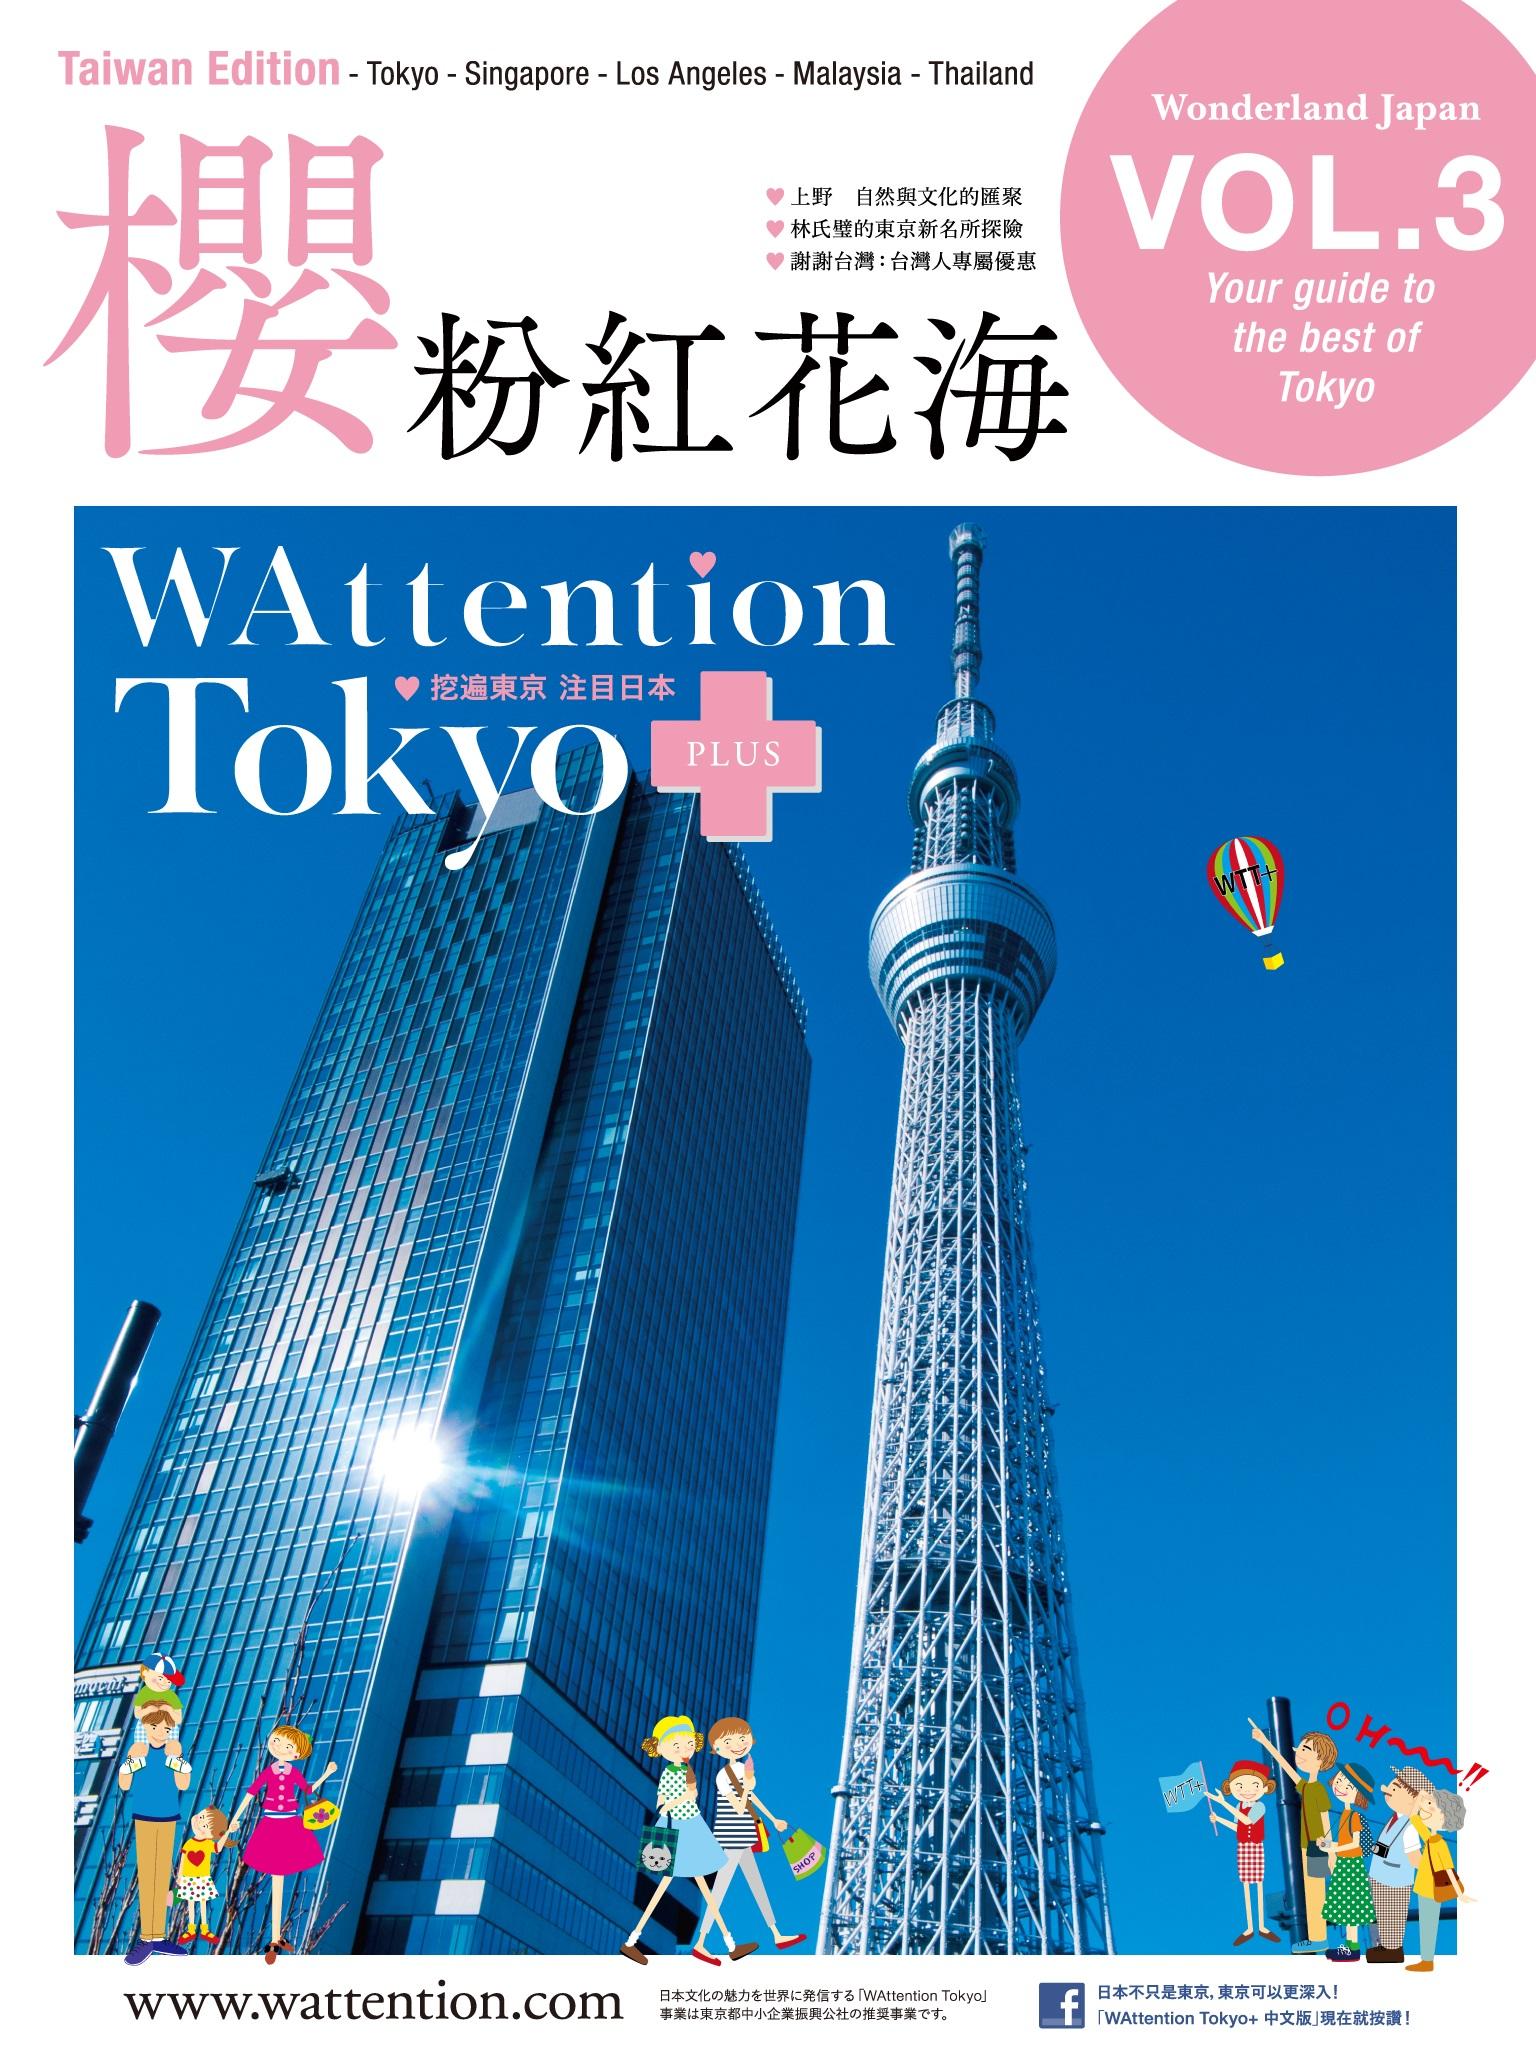 【繁体字版】櫻粉紅花海/ WAttention Tokyo (Taiwan Edition) vol. 03